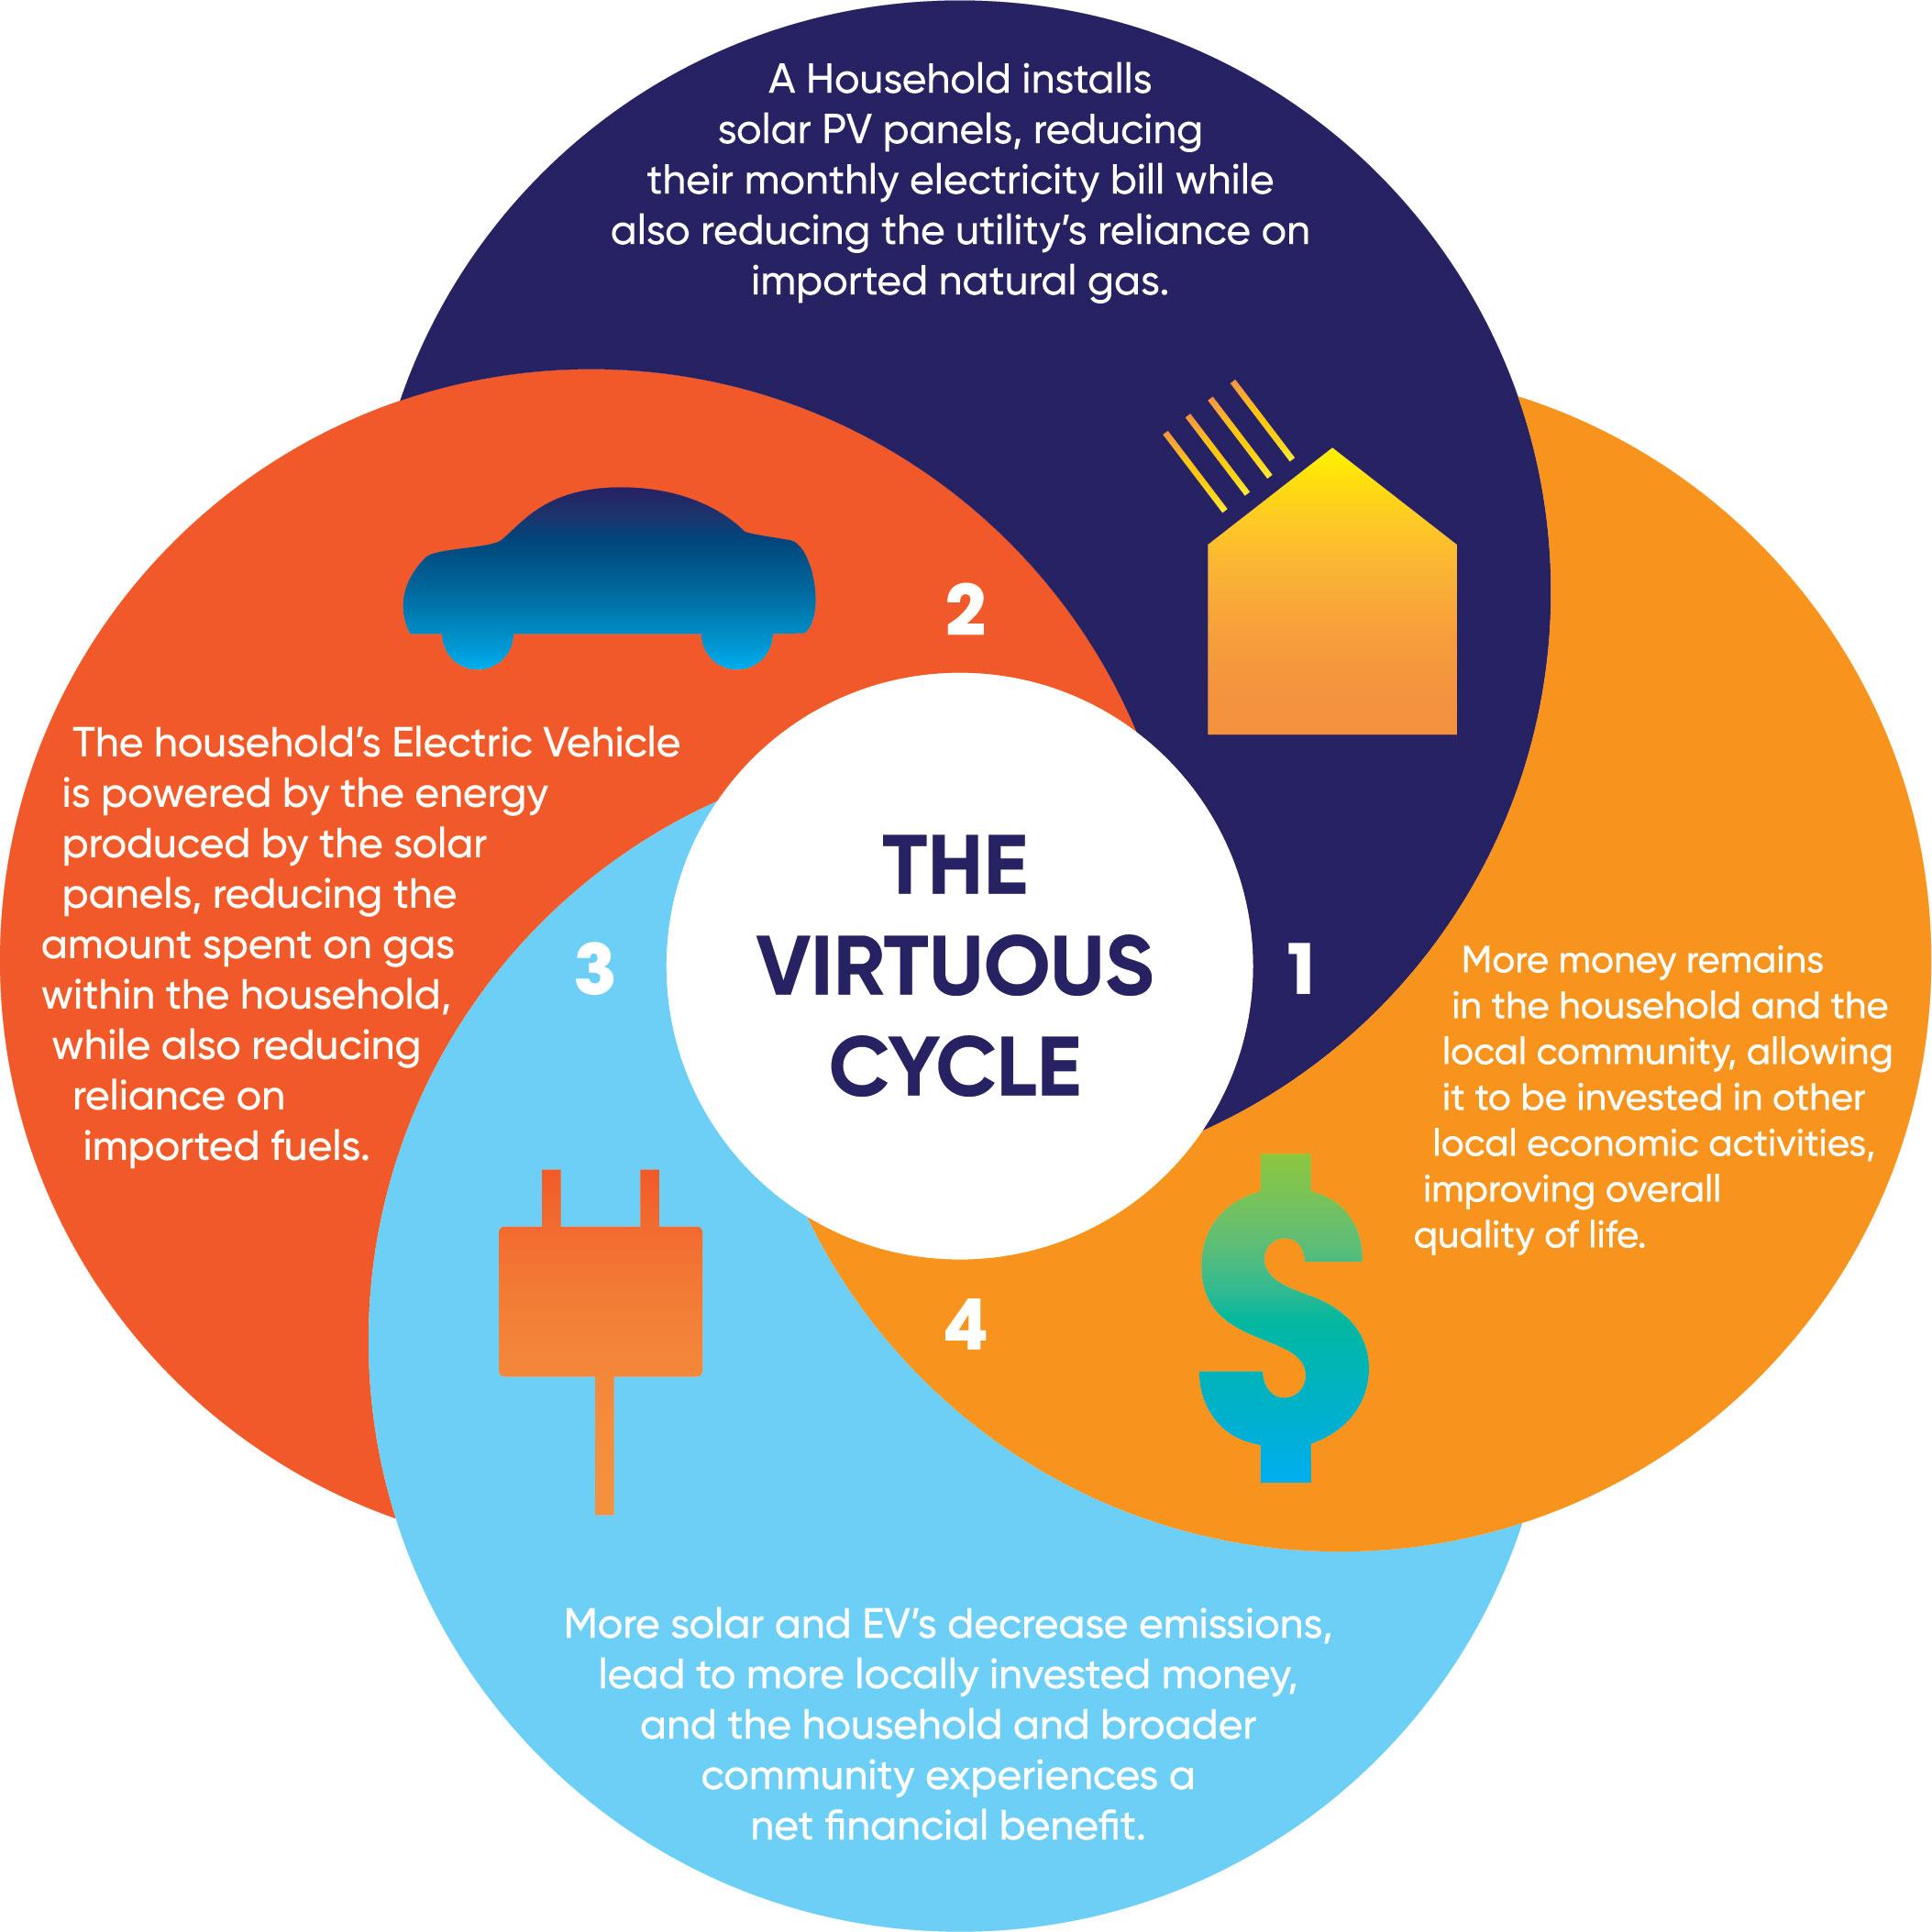 virtuous_cycle_solar_electricvehicle_optimus_solar-03.jpg